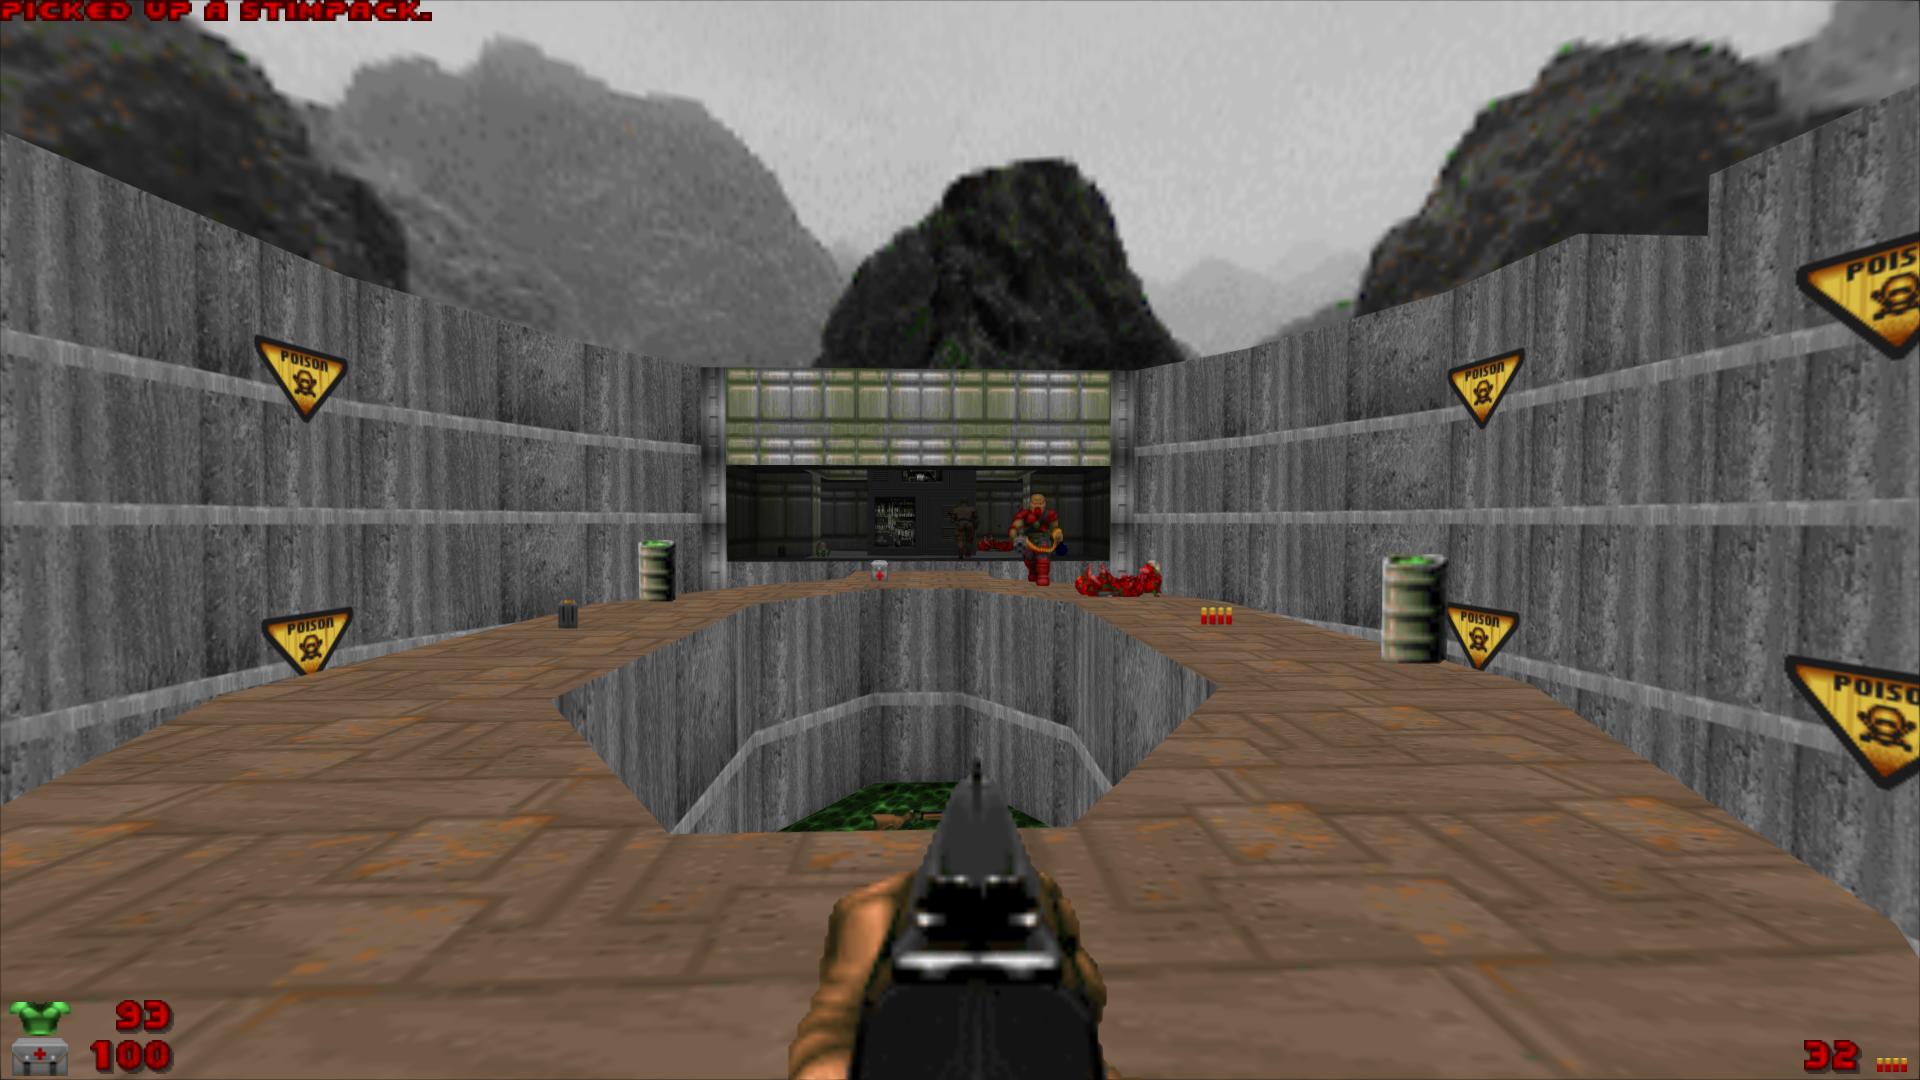 Chaingunner 1 Image Doom Combined Mod For Doom Ii Mod Db